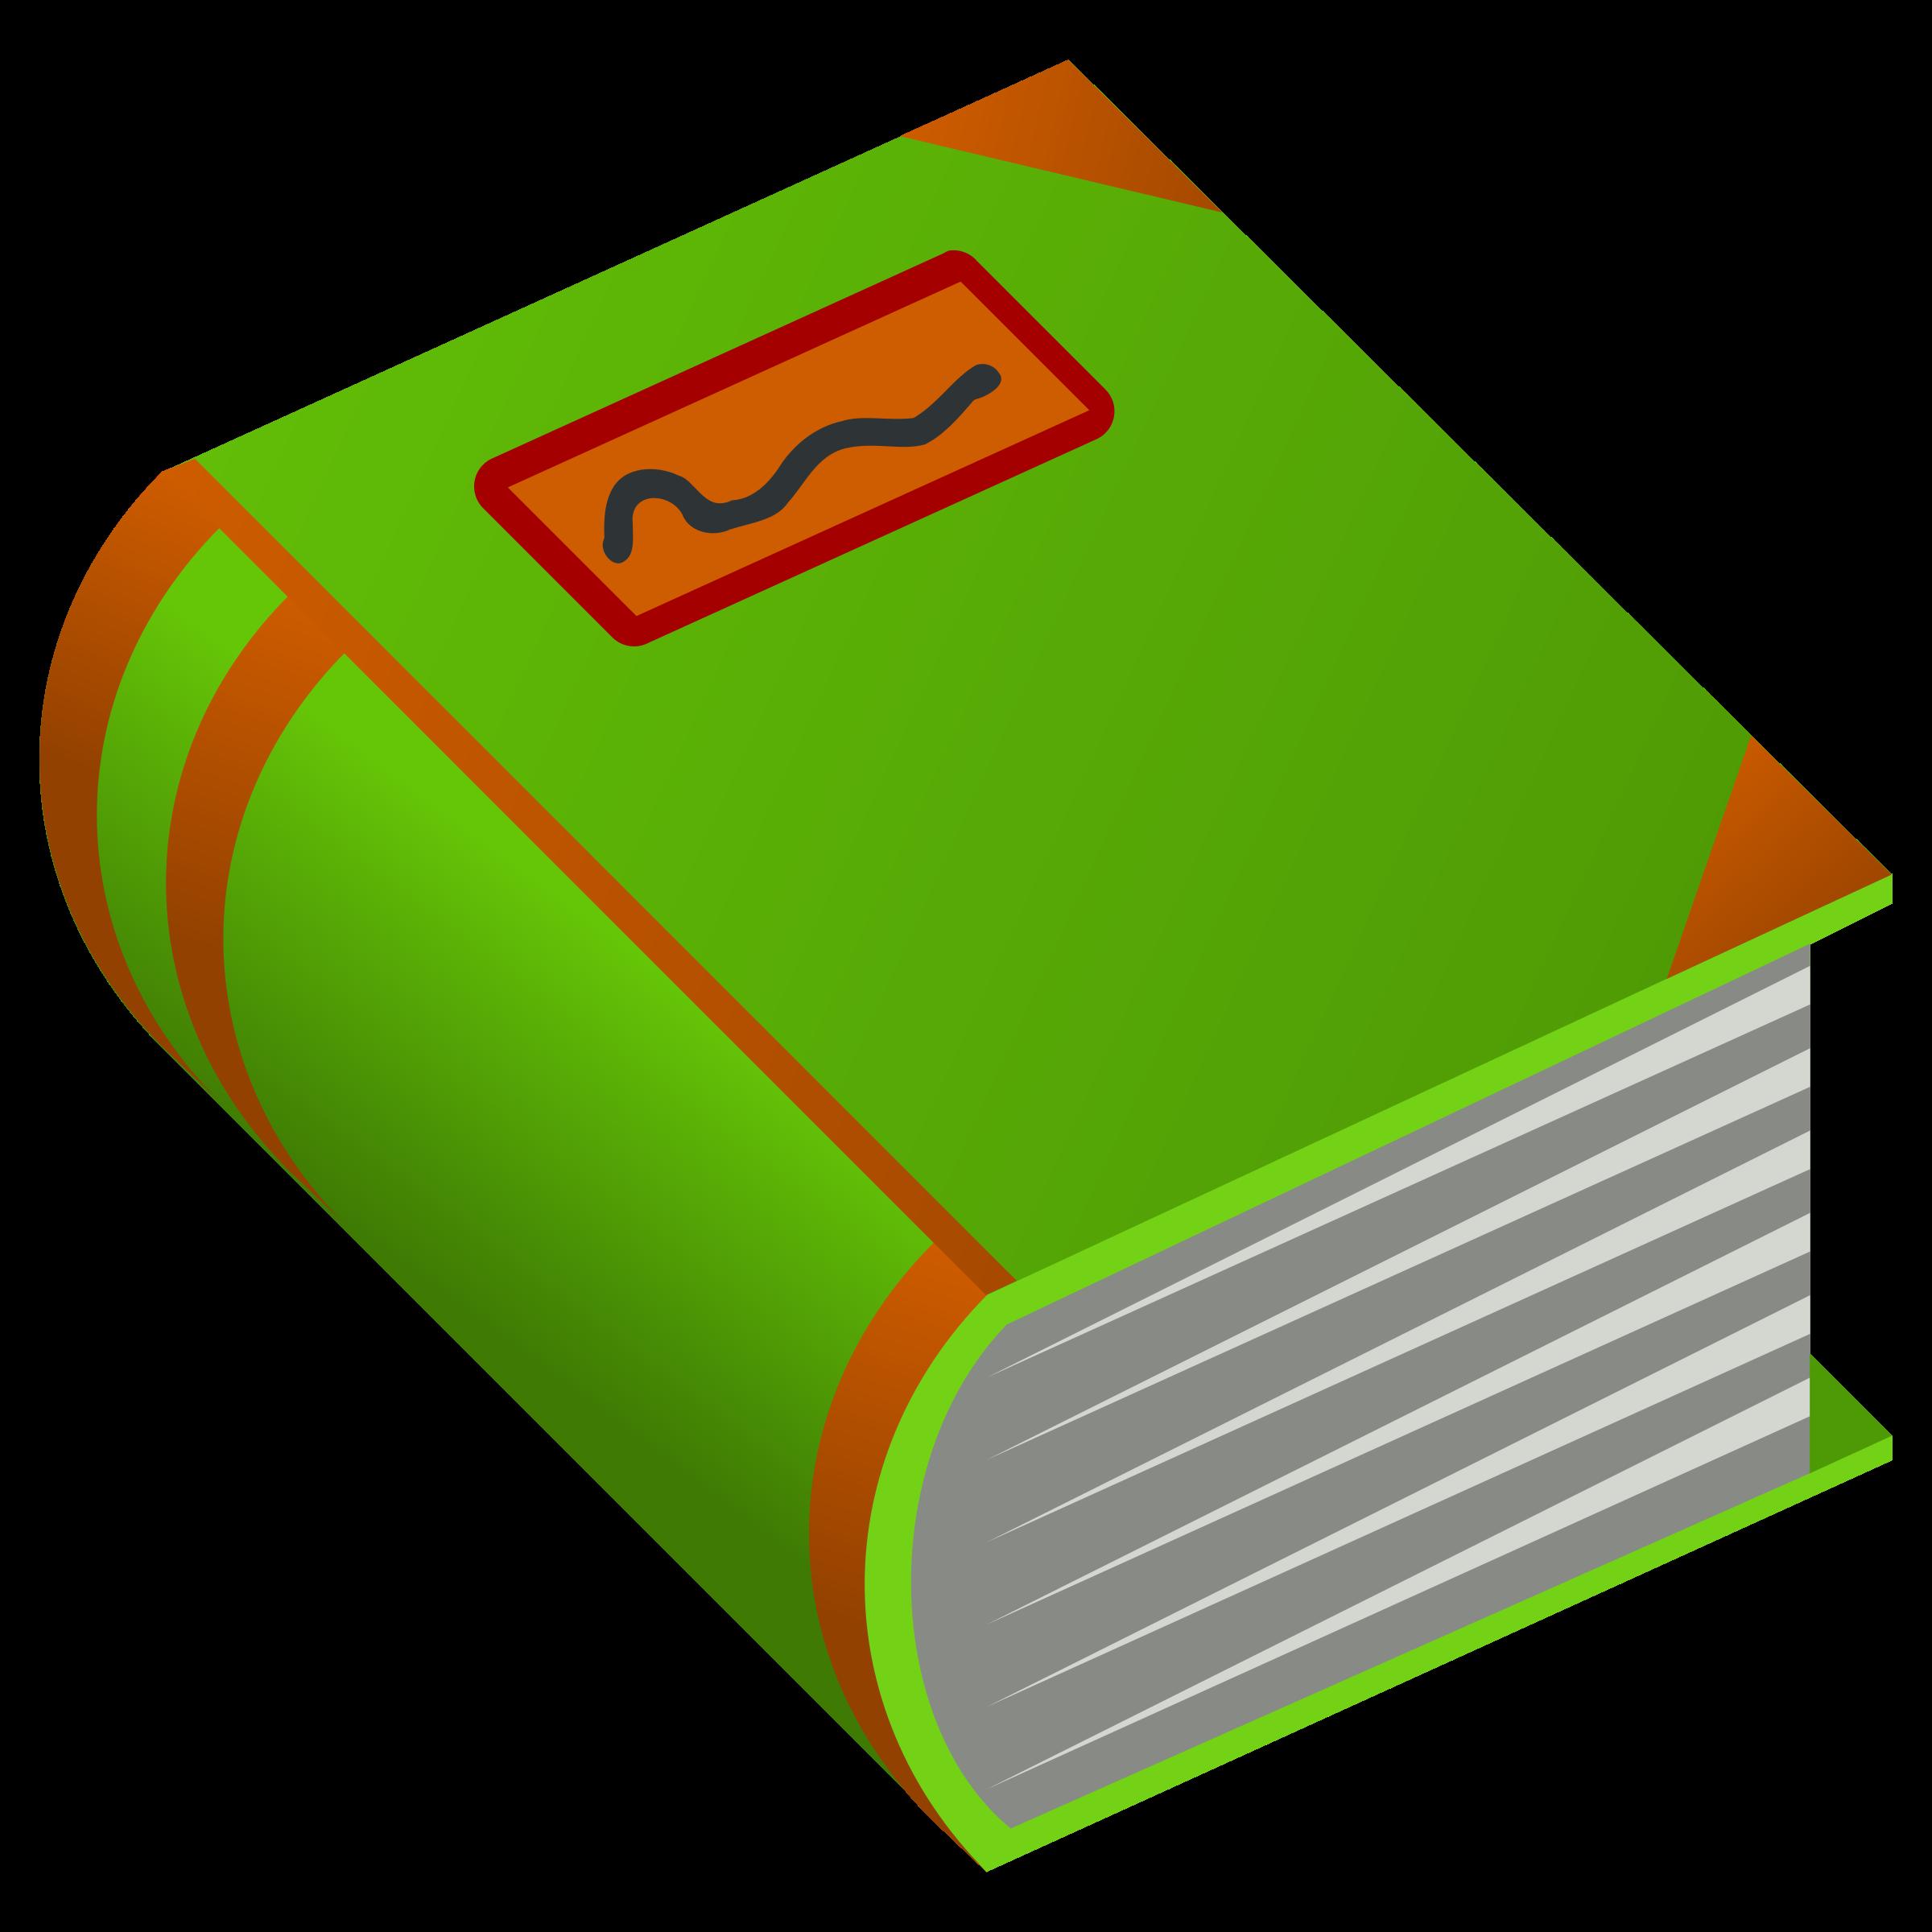 Clipart books cartoon.